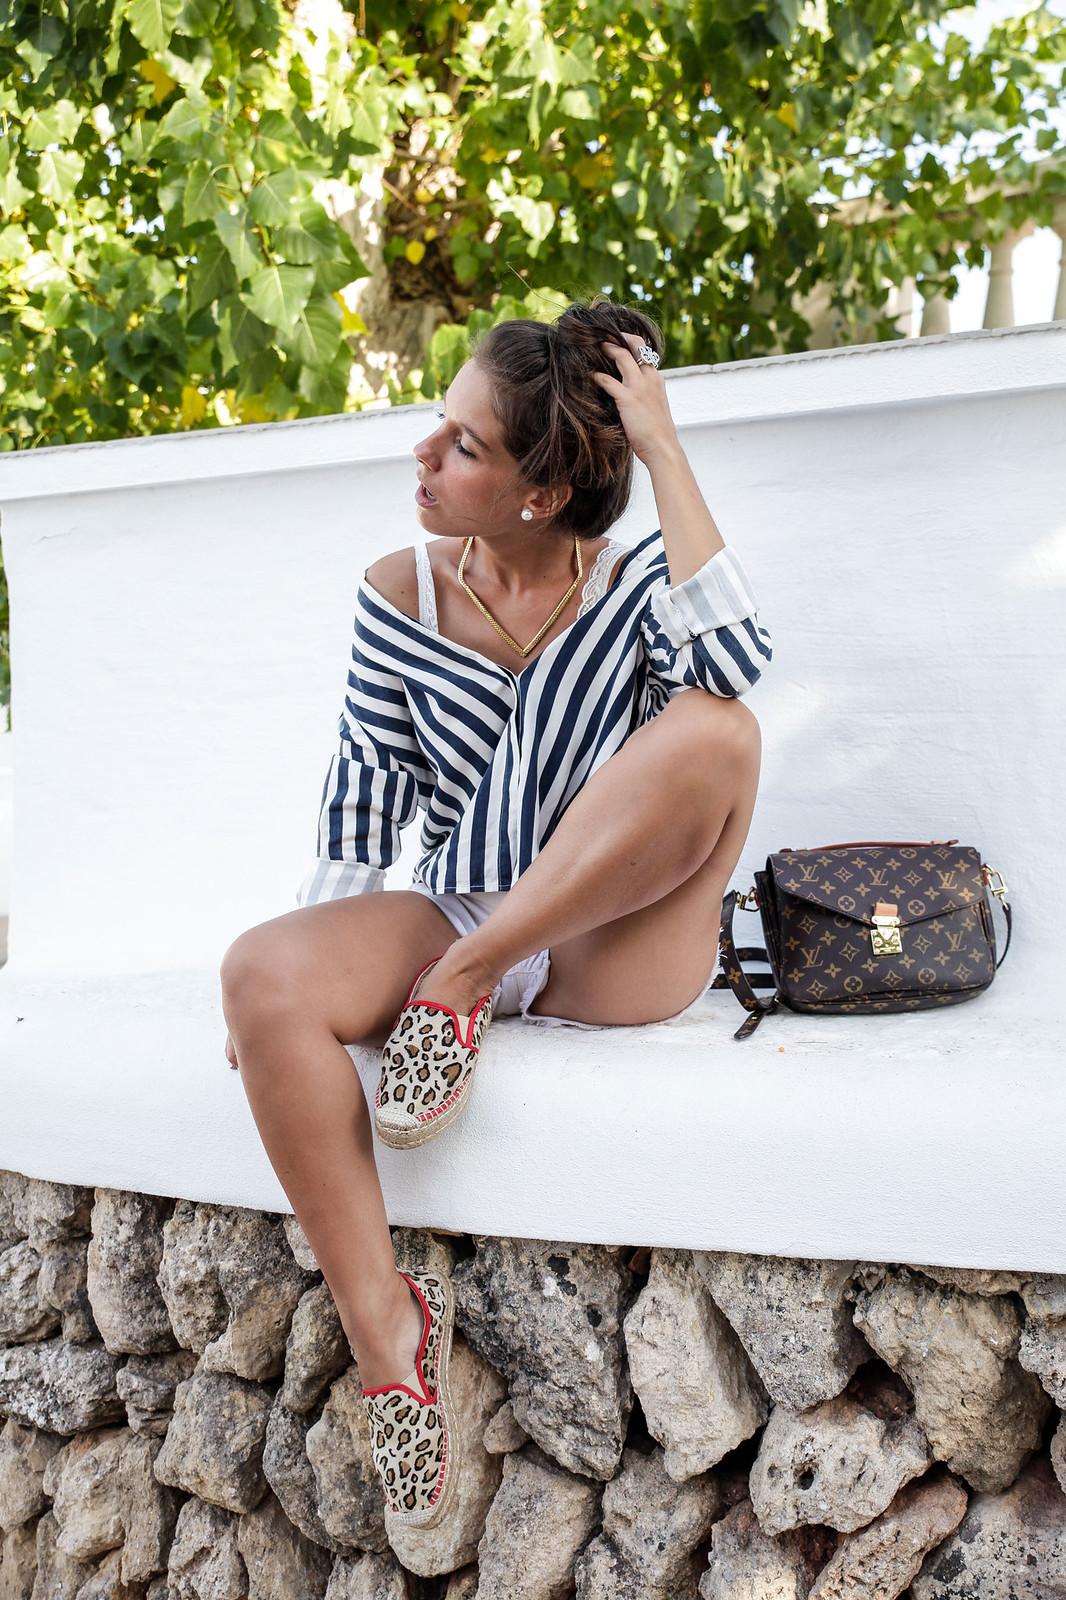 08_Leopard_and_stripes_perfec_mix_print_outfit_THEGUESTGIRL_laura_santolaria_influencer_barcelona